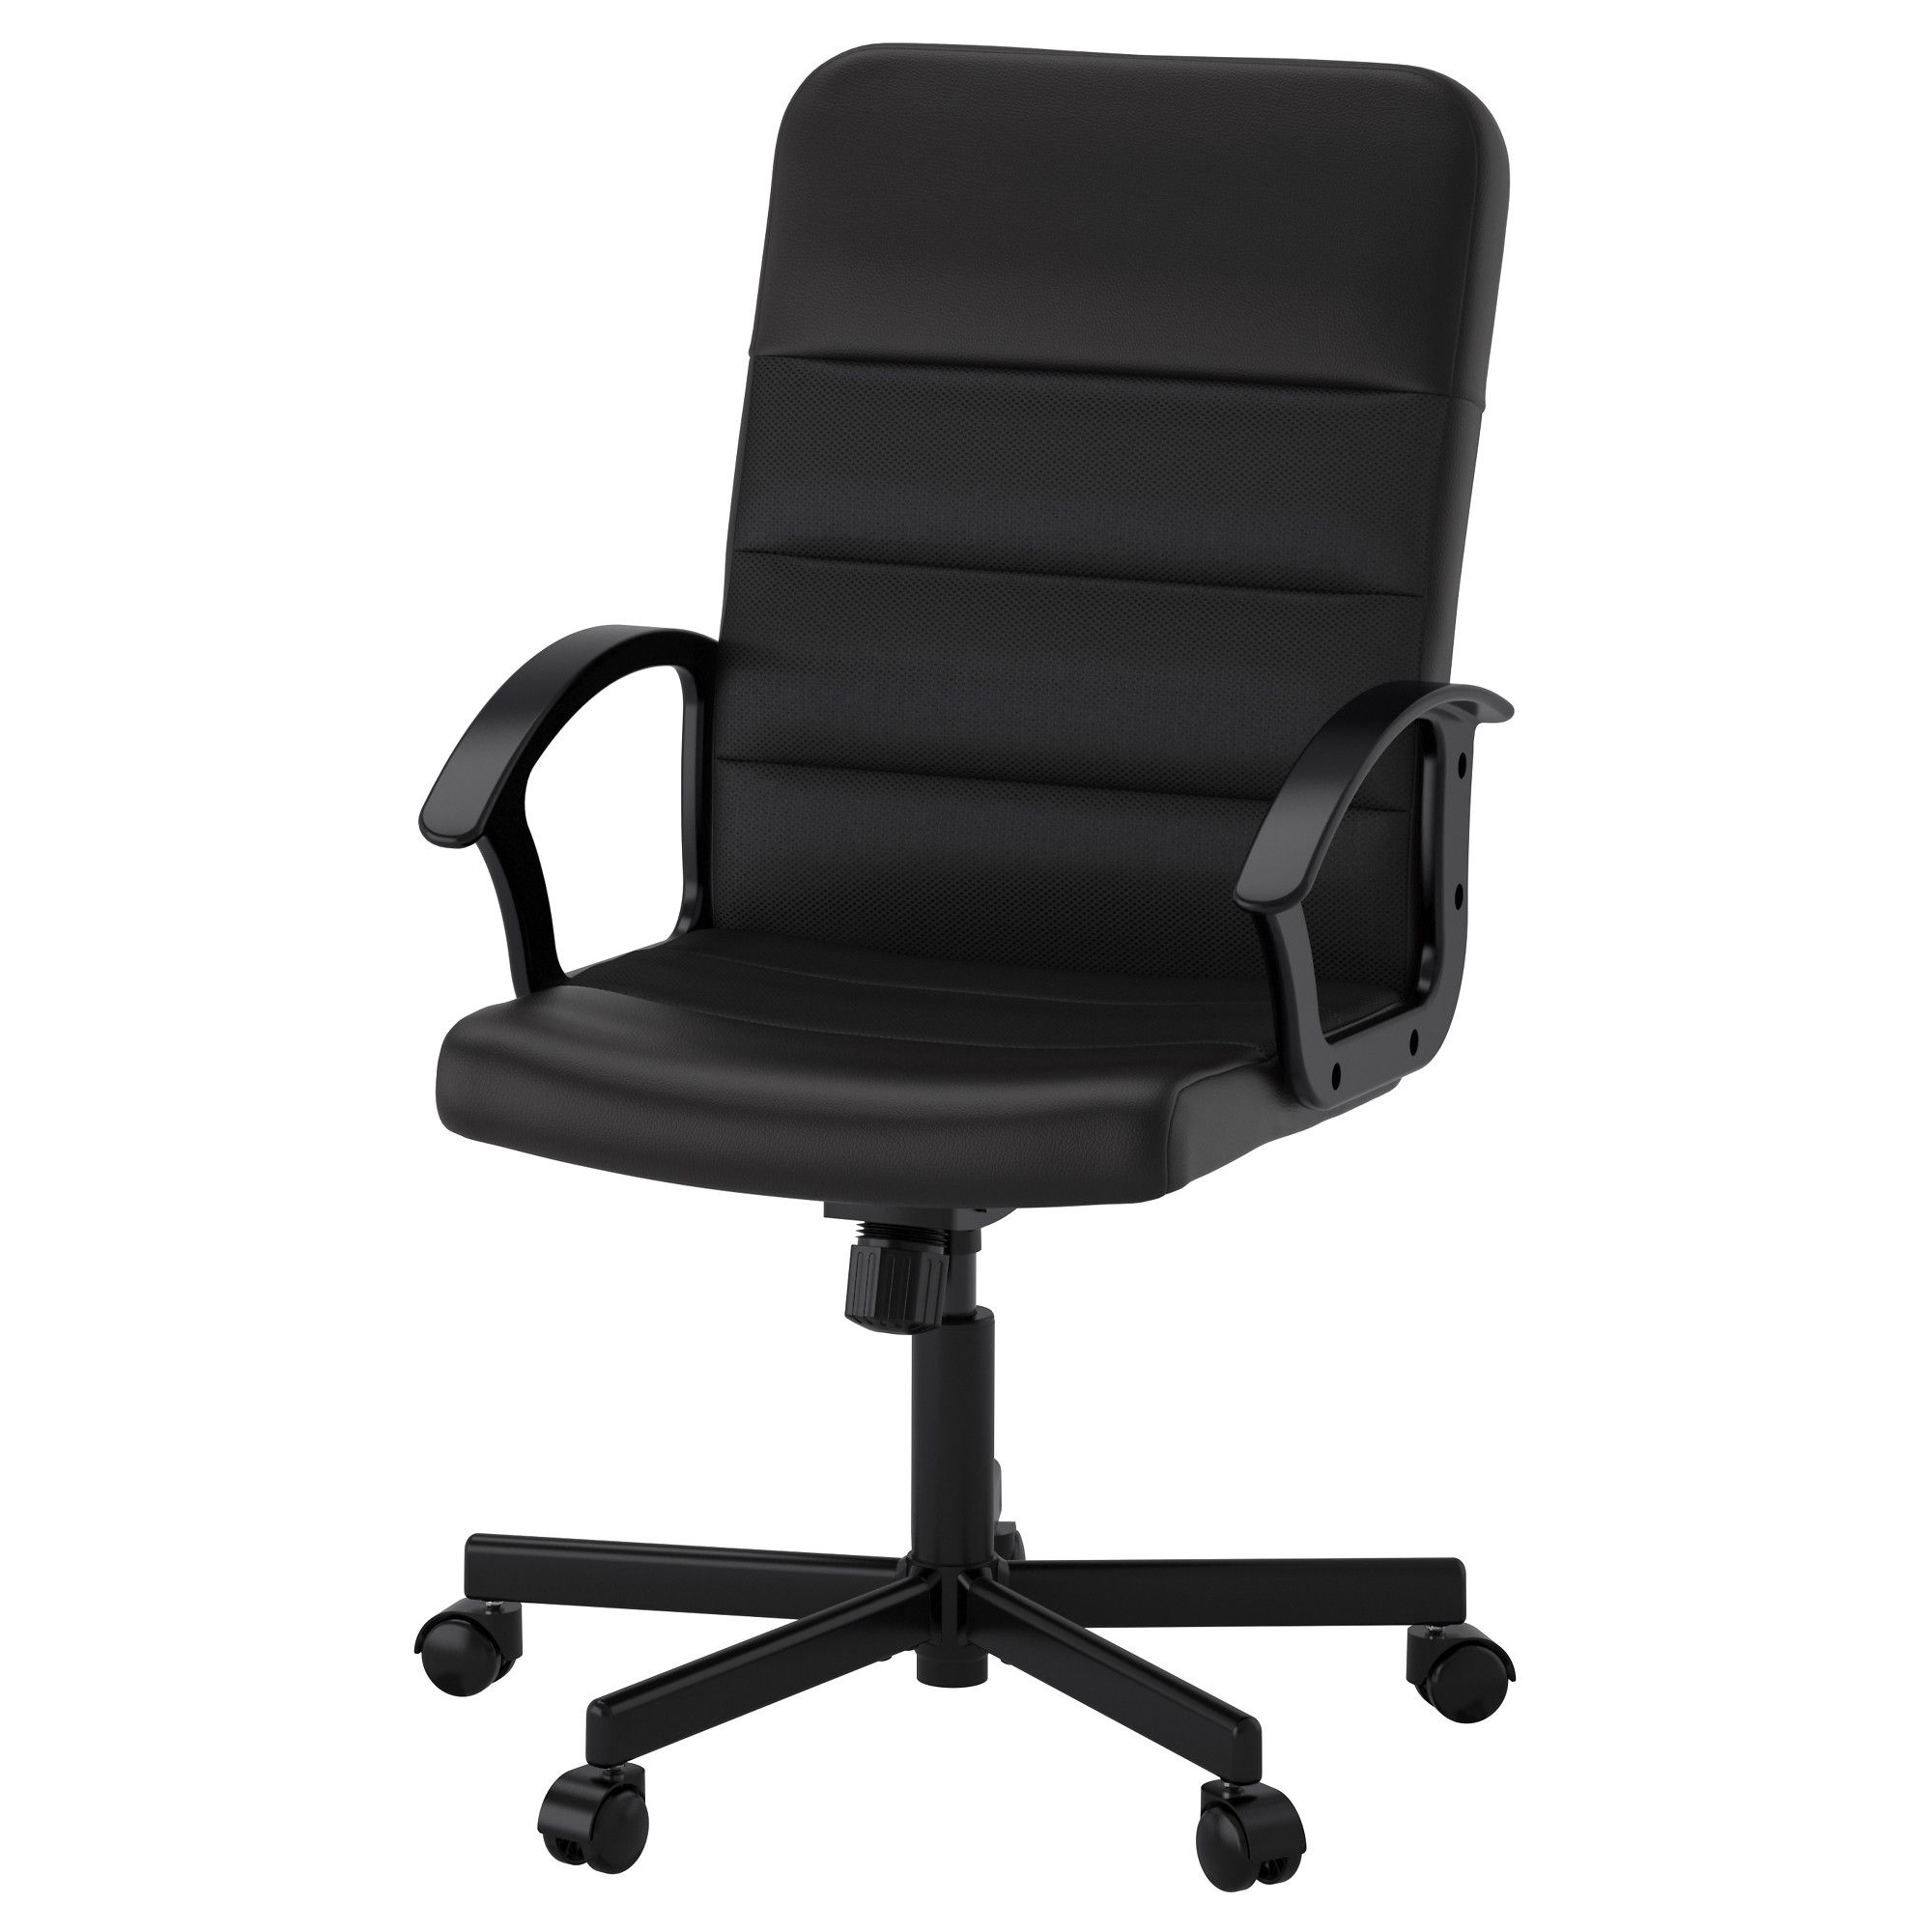 Renberget Swivel Chair Bomstad Black Let S Hear It For